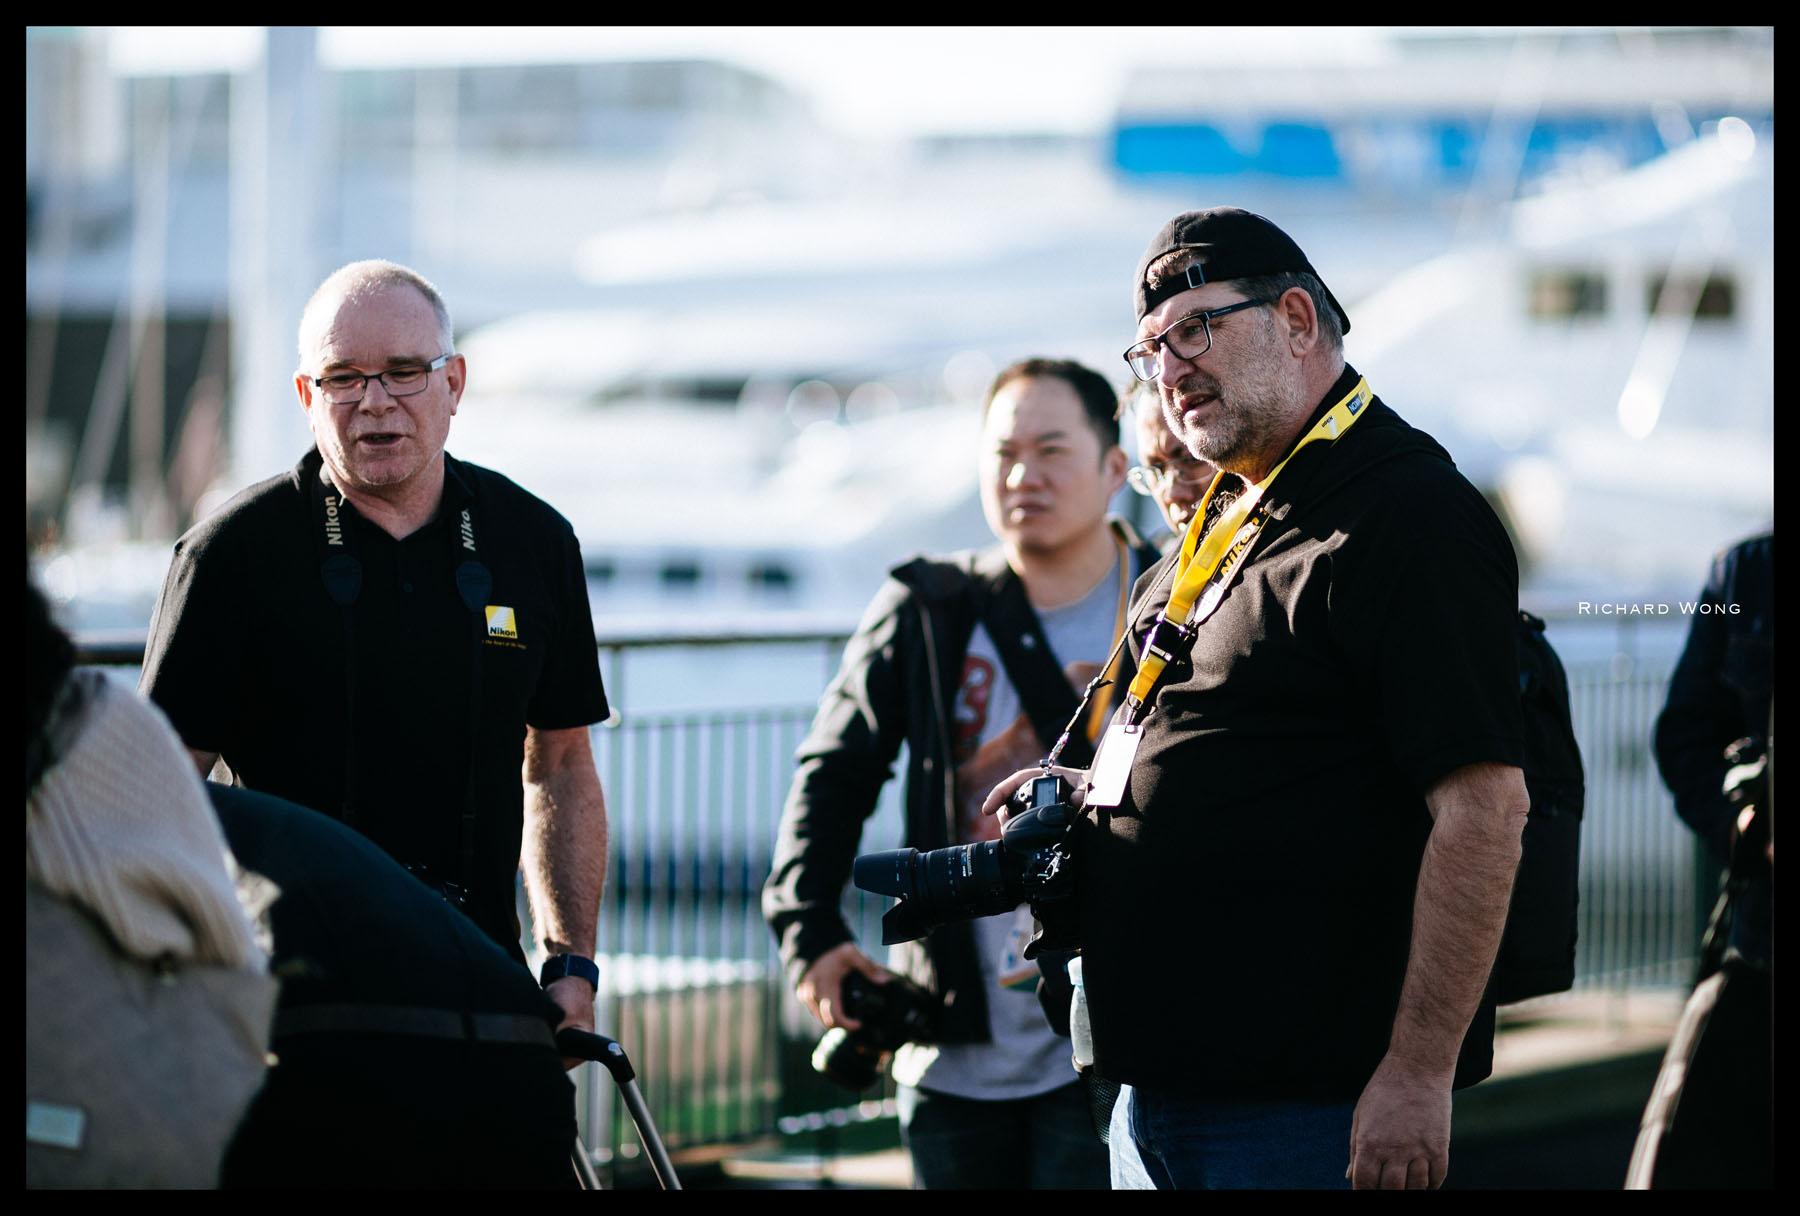 Nikon-Auckland-Photo-Day-2016-29